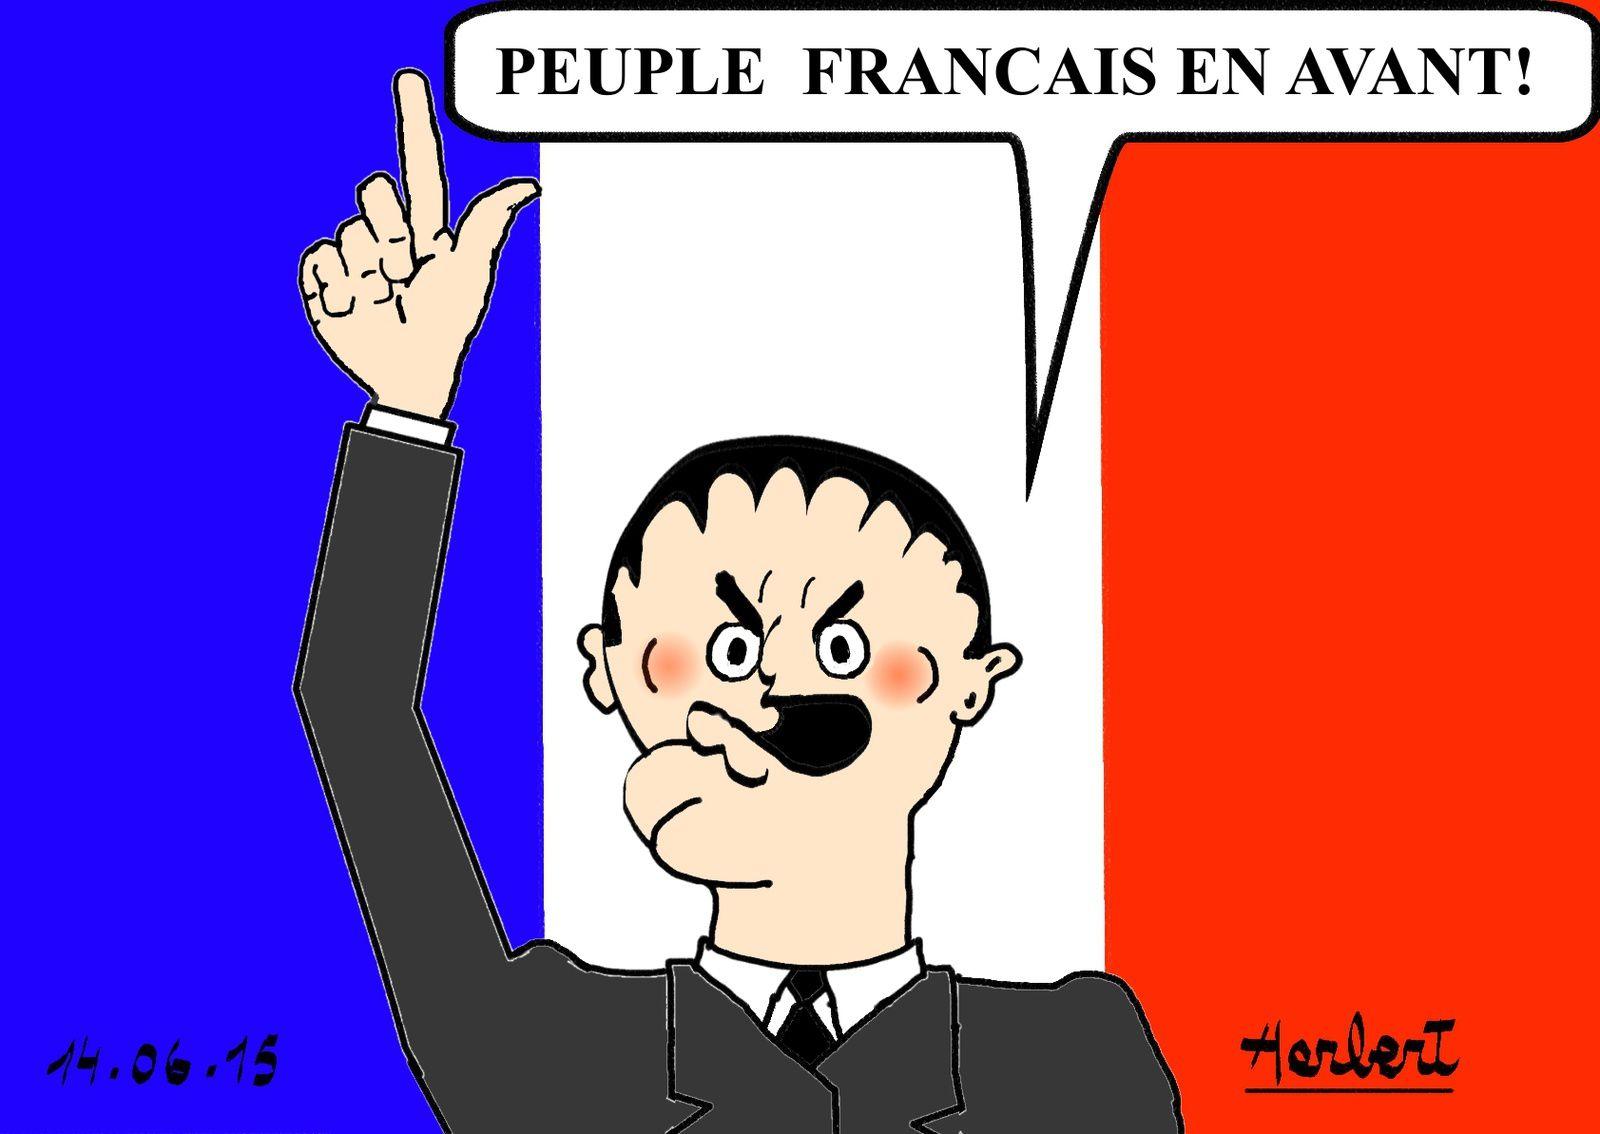 Valls nullos